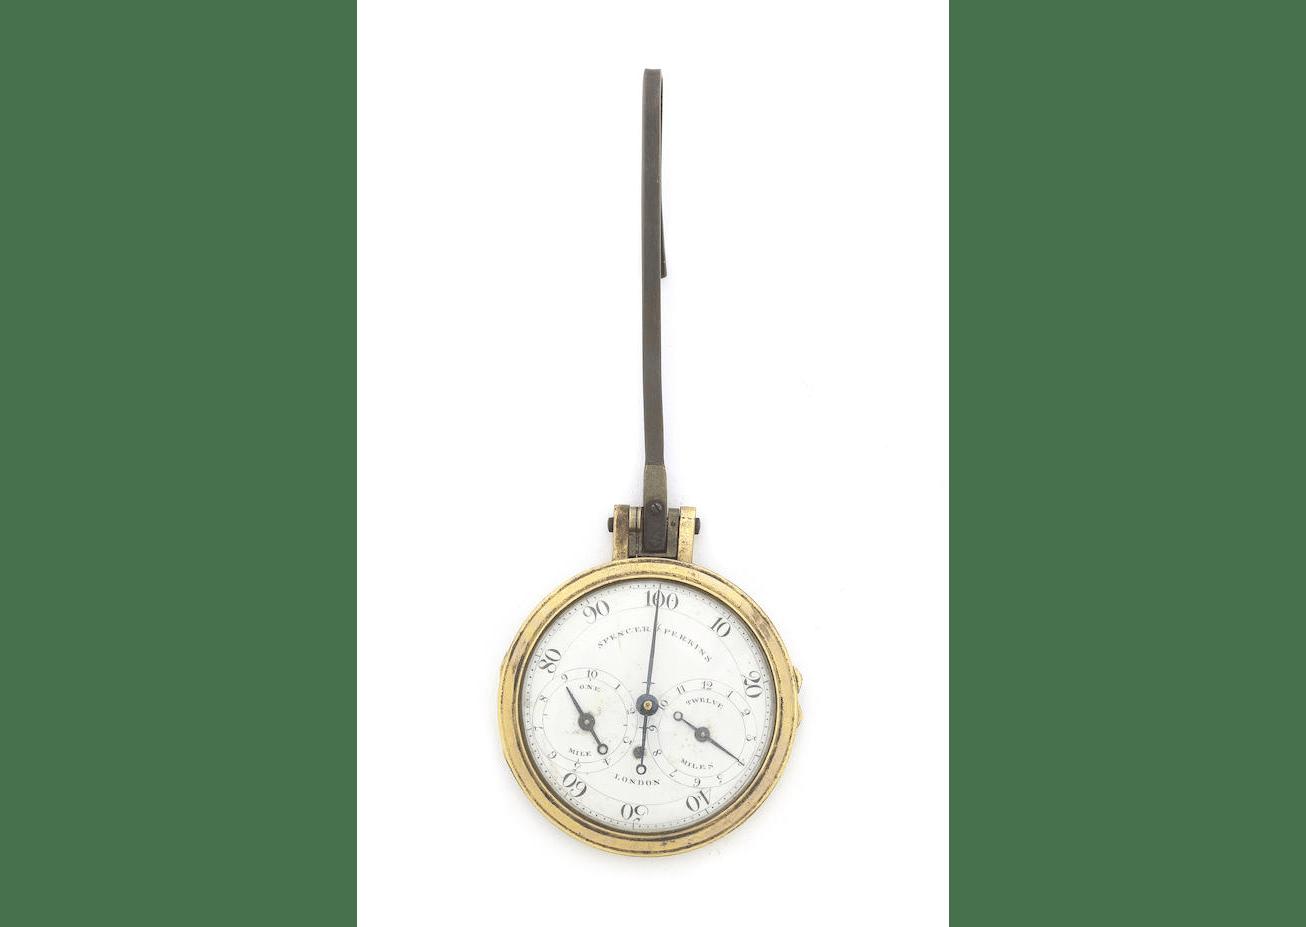 Bonhams scientific instruments sale preview includes rare